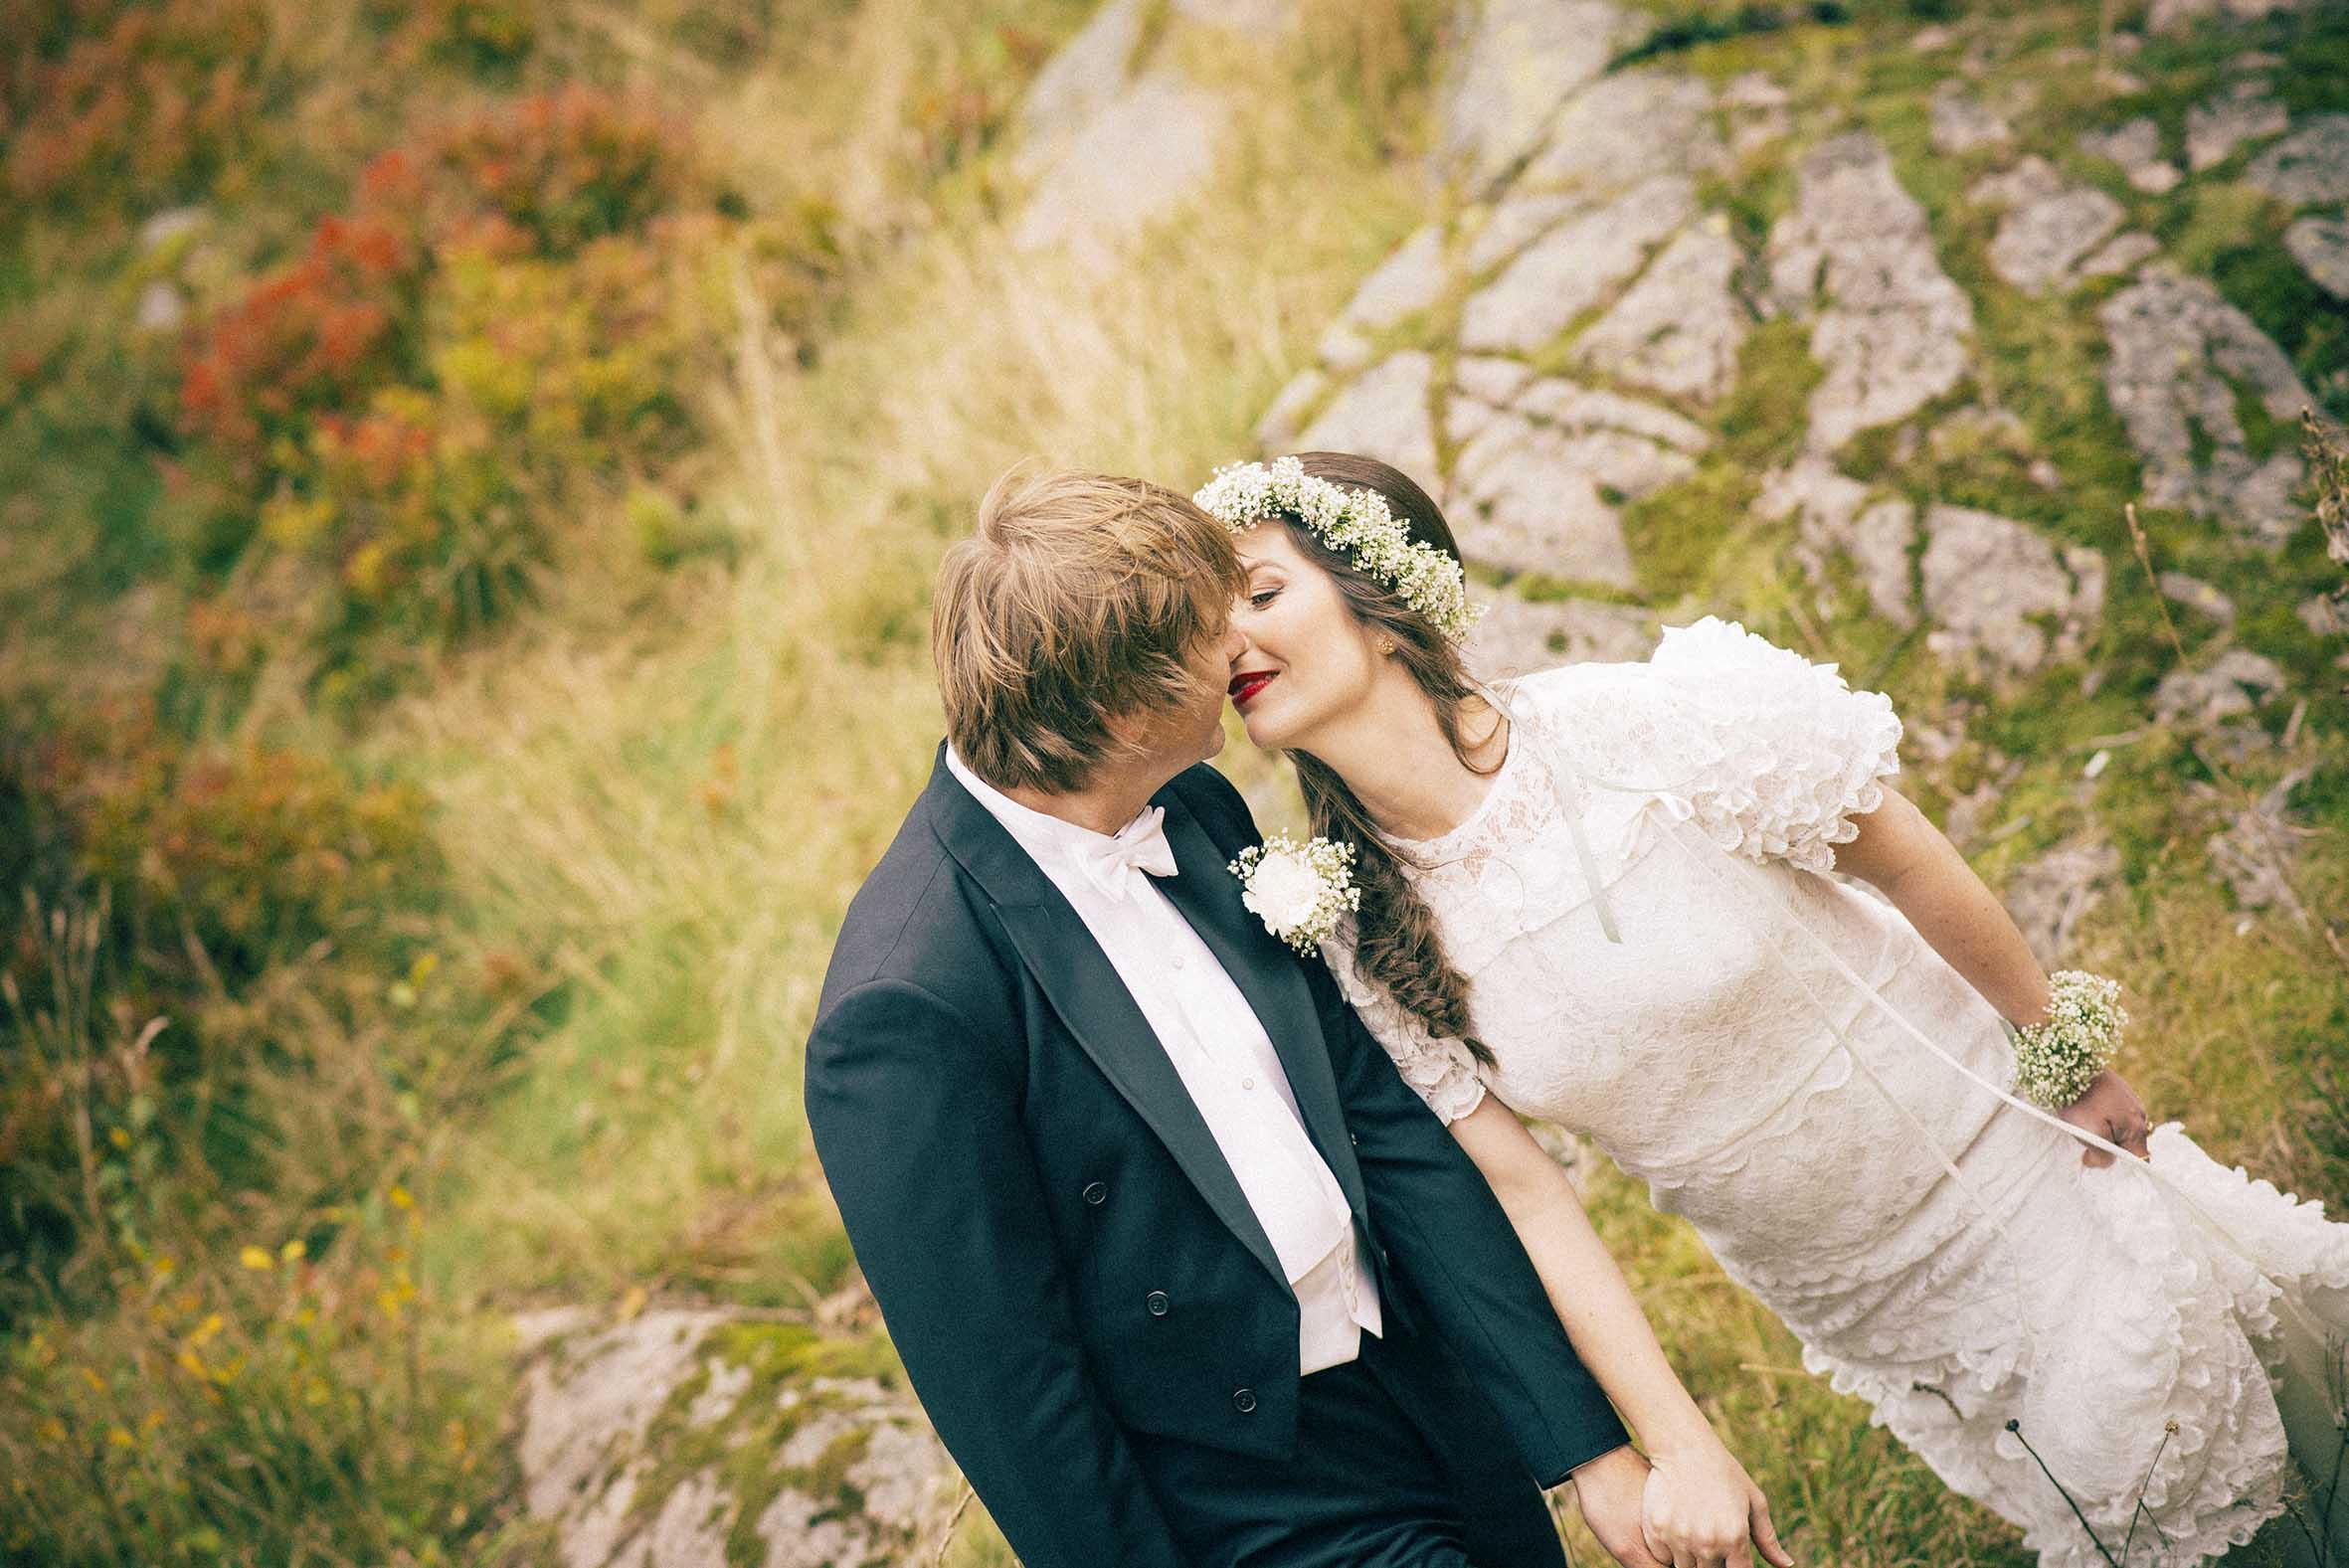 Kysset i skogen, romantisk bilde fra høst bryllupsfotografering